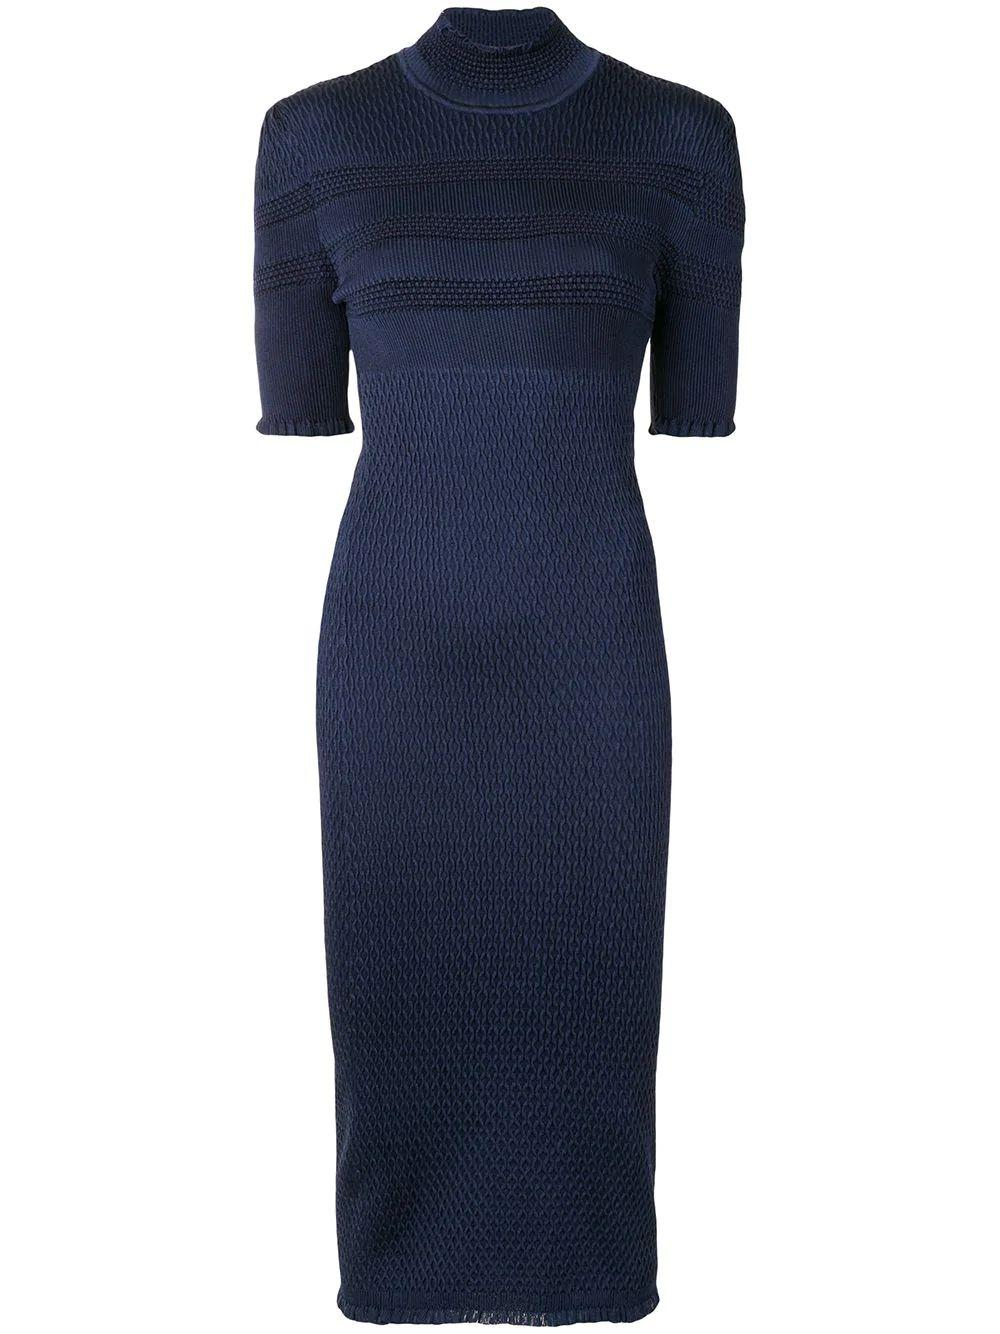 Knit Turtleneck Long Dress